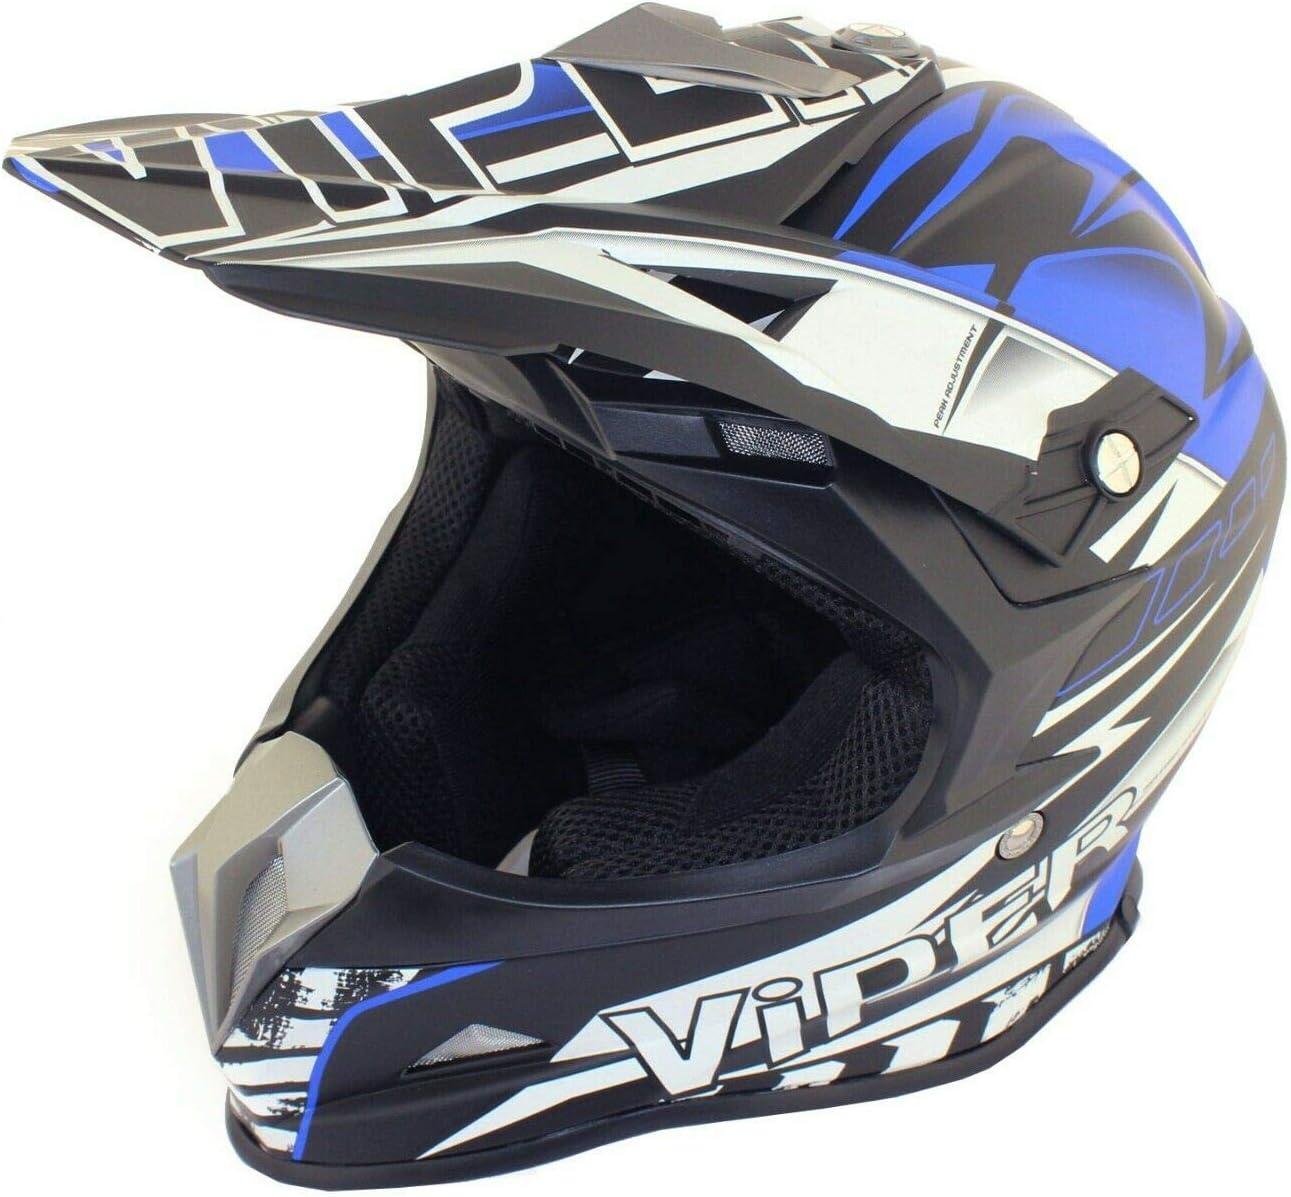 Adult Mx Helmet Motorbike Road Legal On and Off Road Motorcycle Quad Pit Dirt Bike Racing ATV Motocross VIPER RSX121 Enduro Helmets